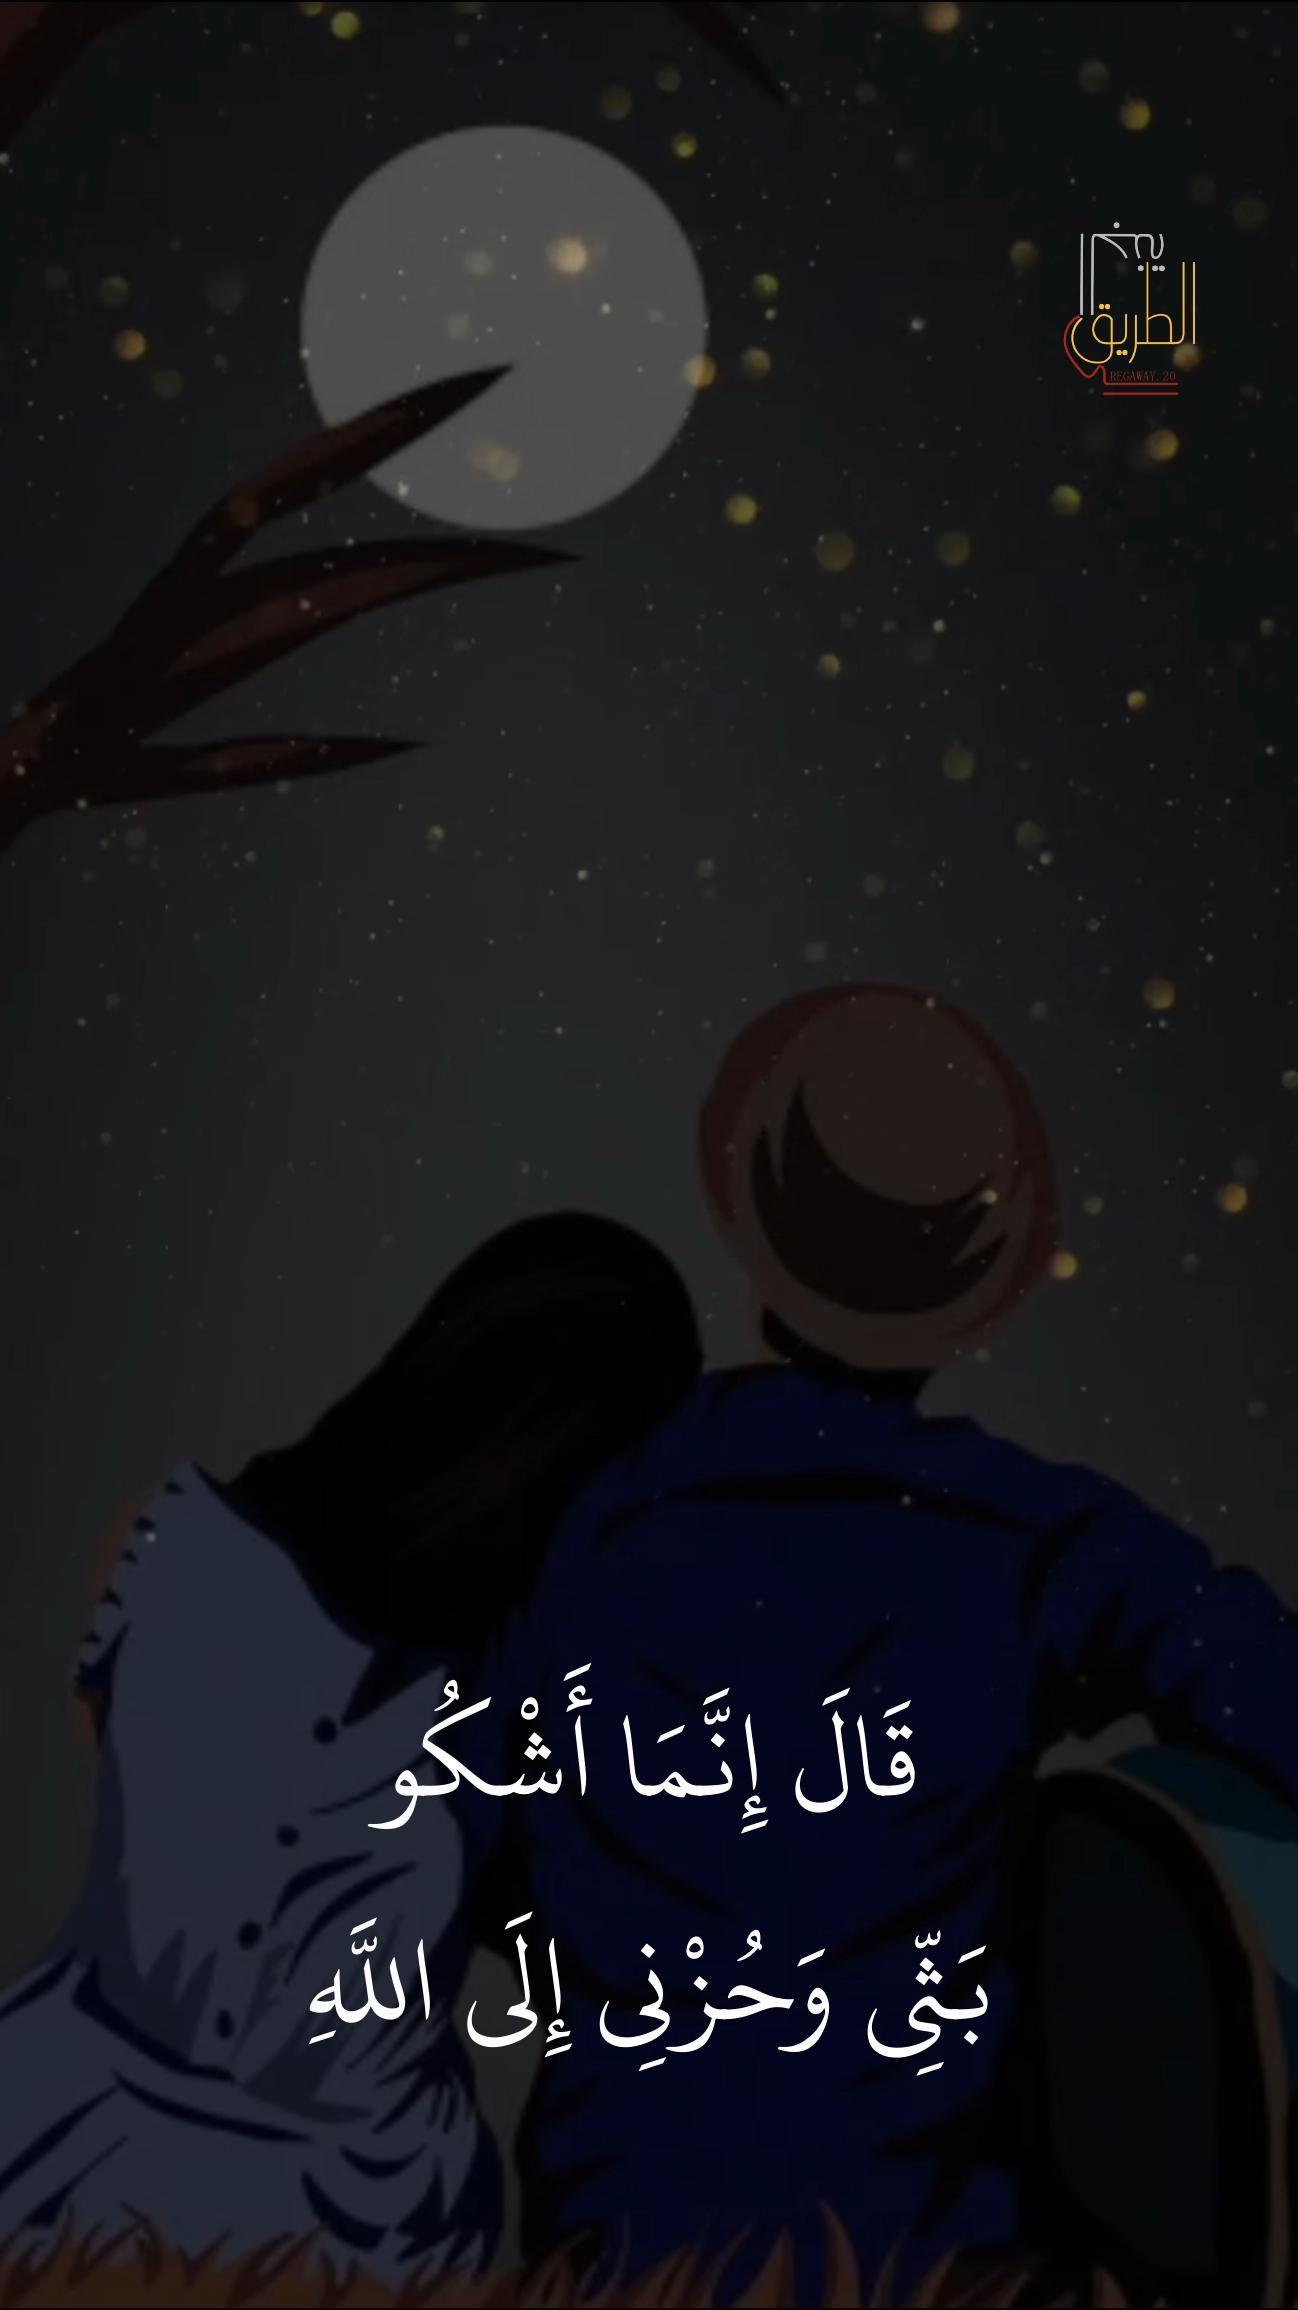 Very Emotional Quran Recitation Video In 2021 Quran Recitation Quran Quotes Love Muslim Couple Quotes